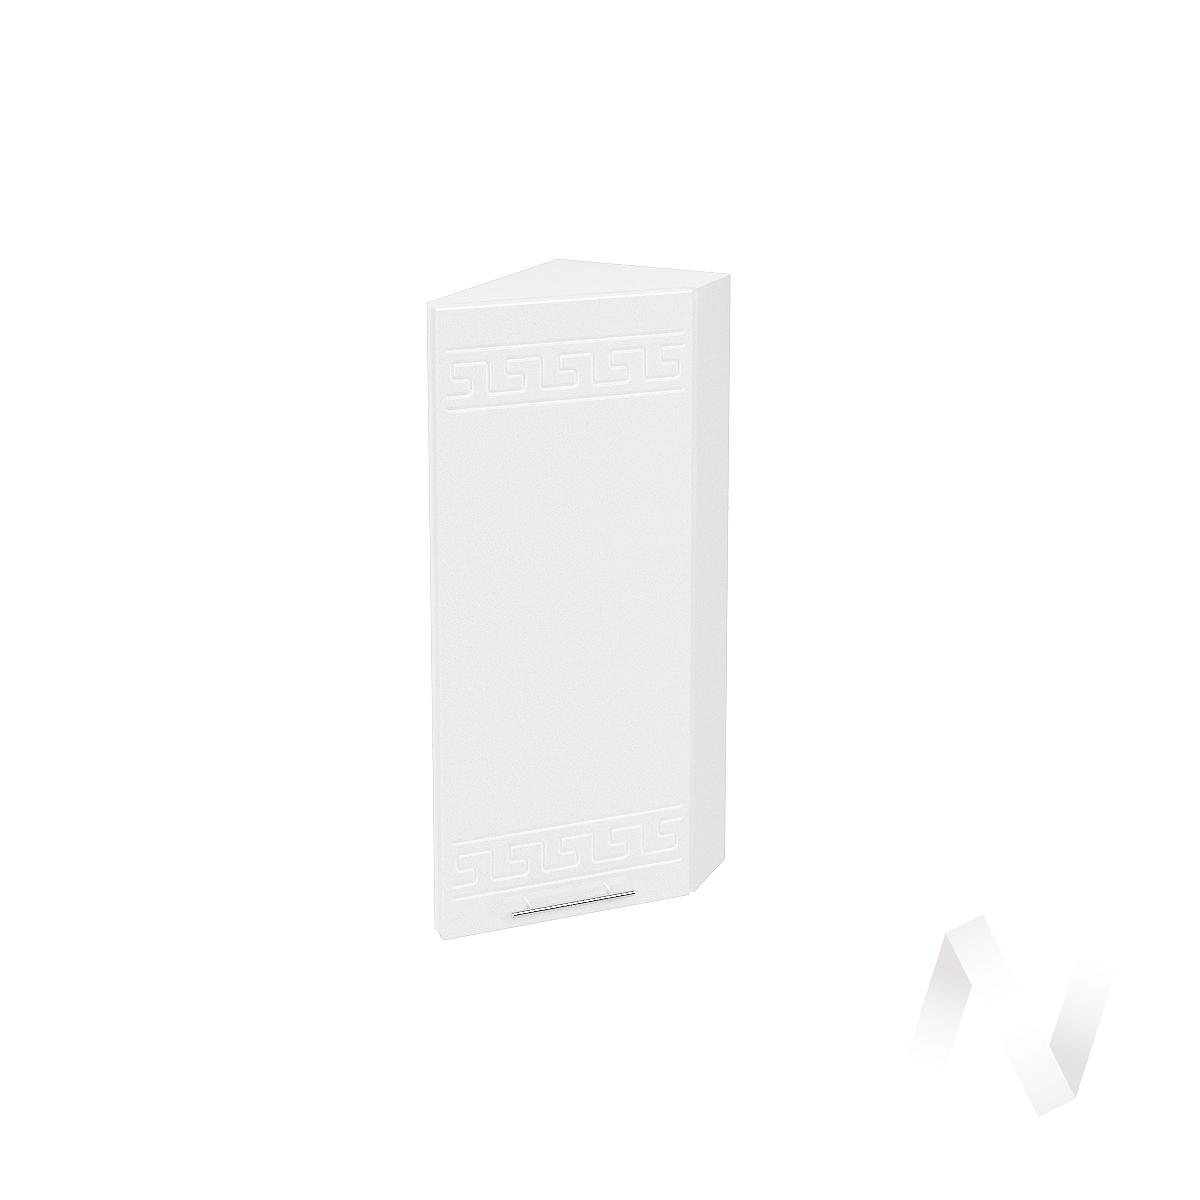 "Кухня ""Греция"": Шкаф верхний торцевой 224, ШВТ 224 (белый металлик/корпус белый)"